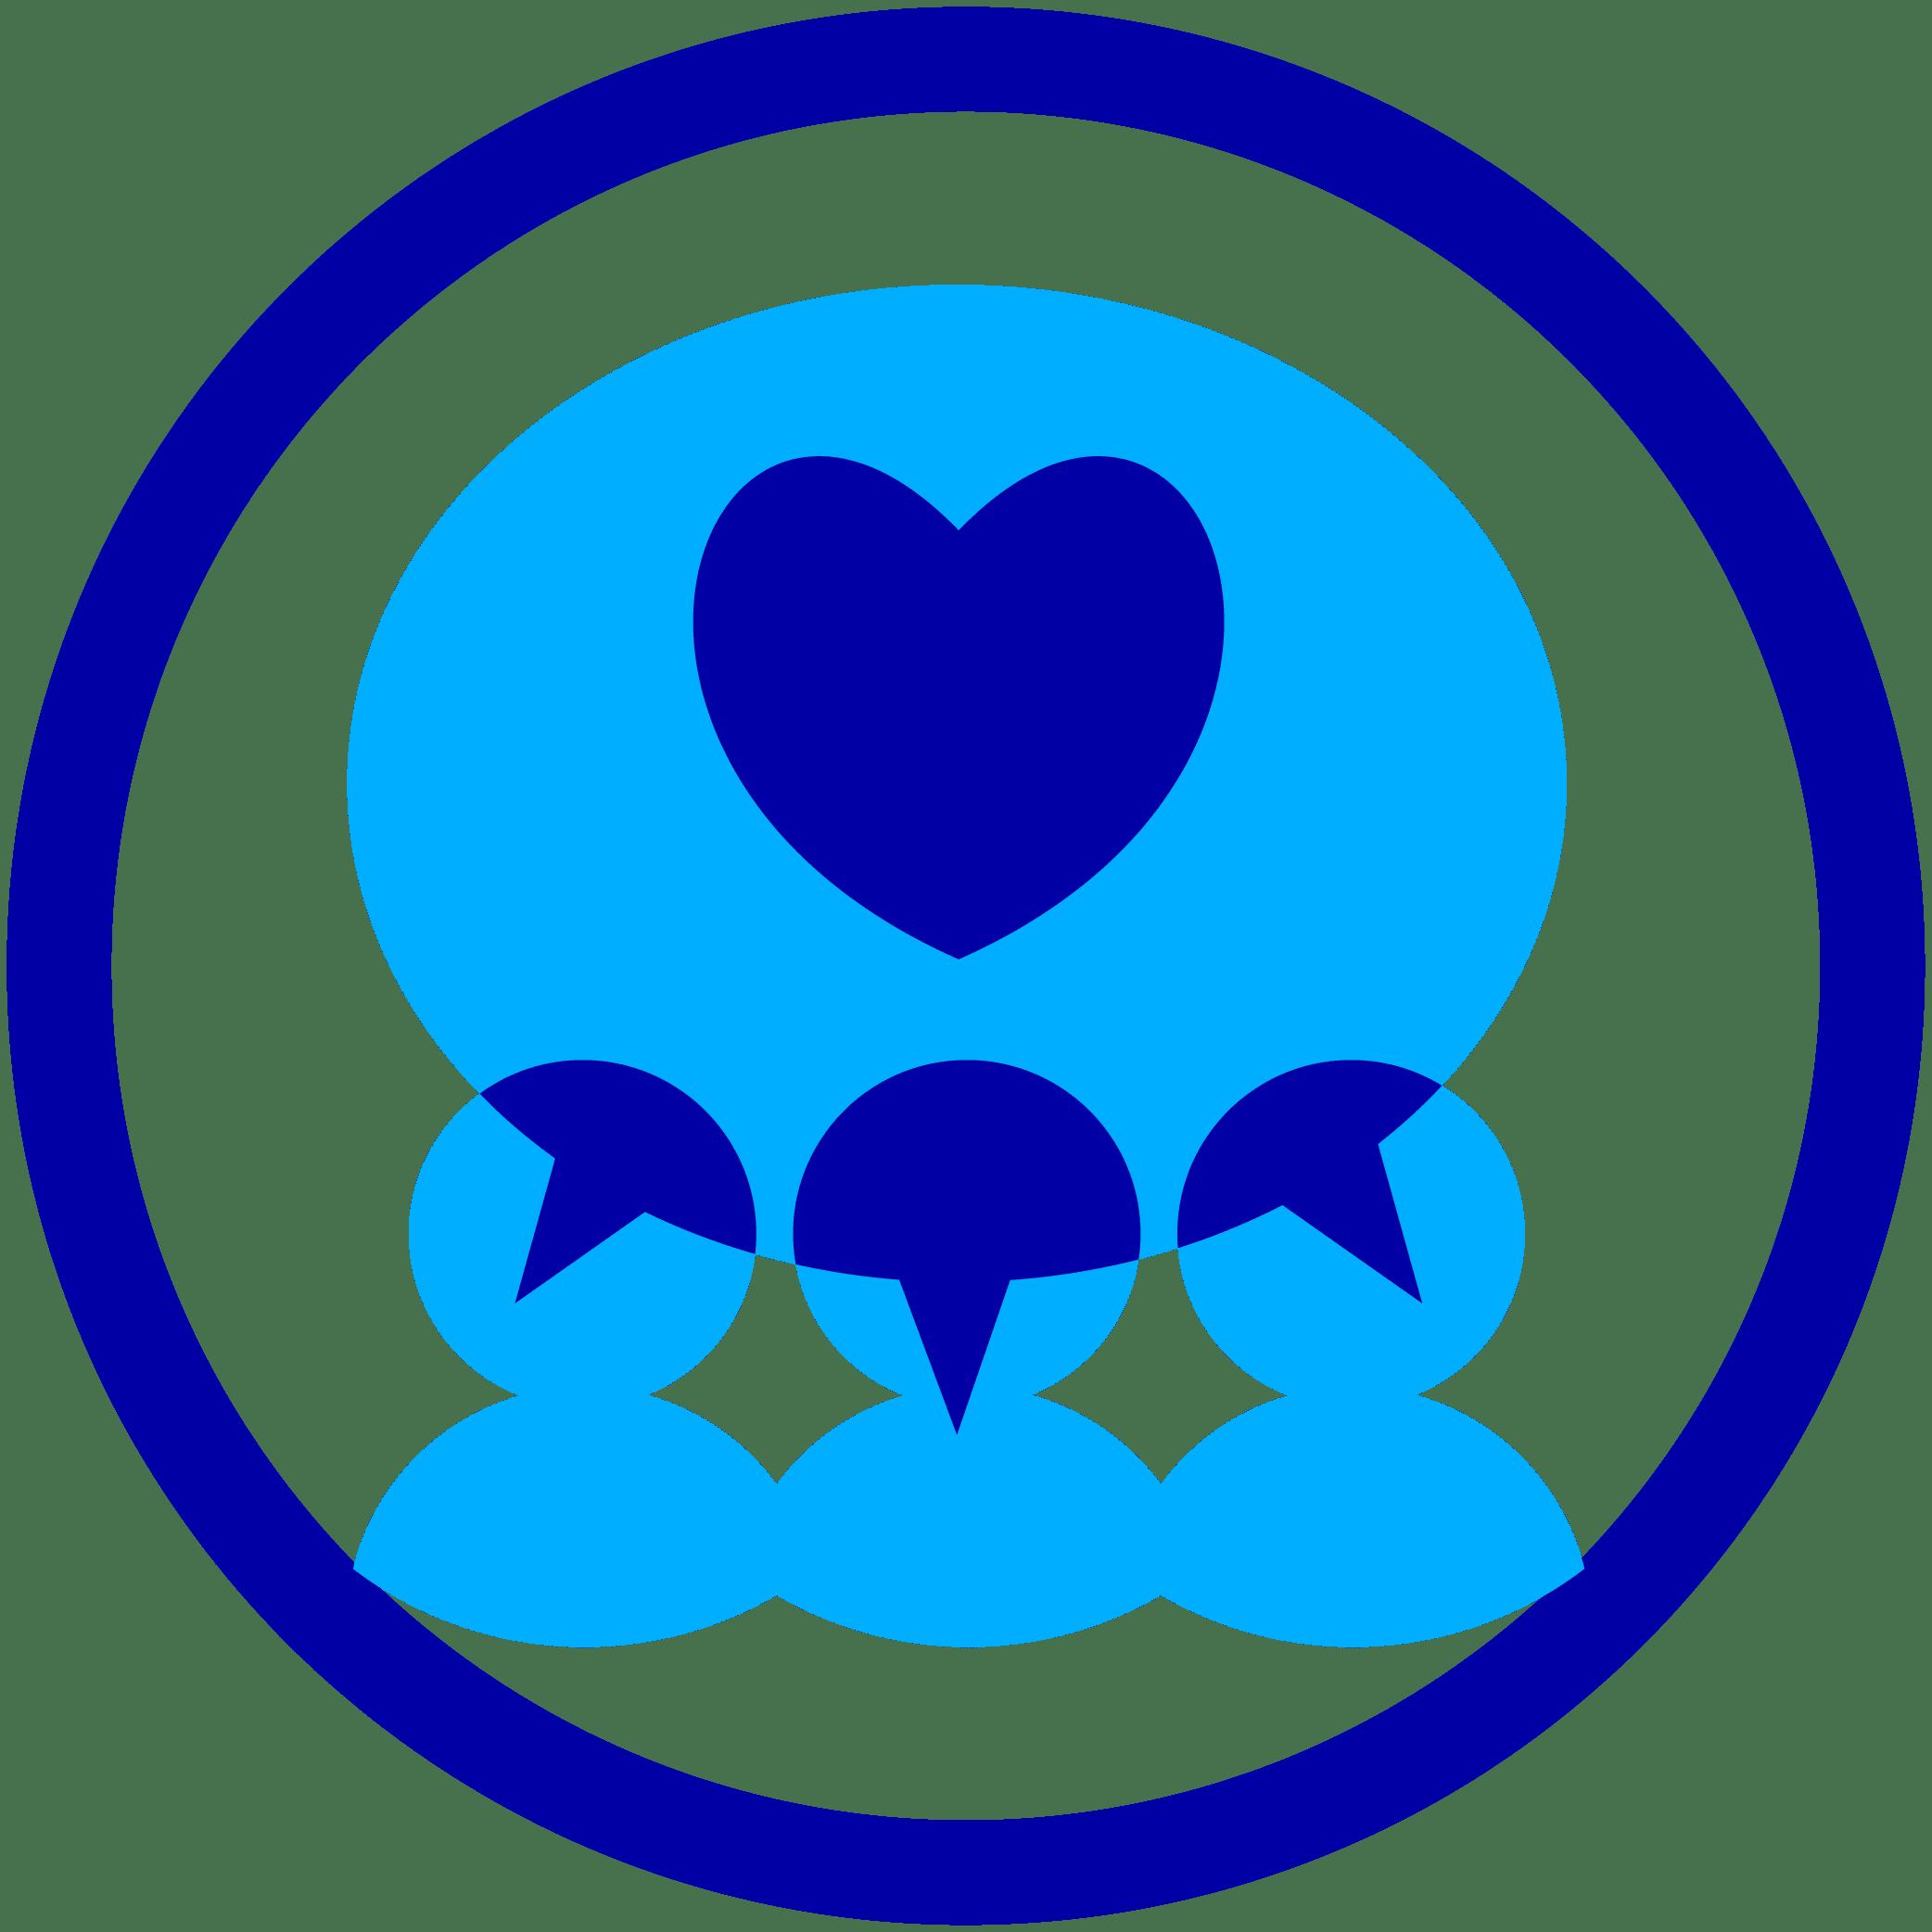 https://uk.fi-group.com/wp-content/uploads/sites/7/2021/02/blue-icons-set_1-54.png